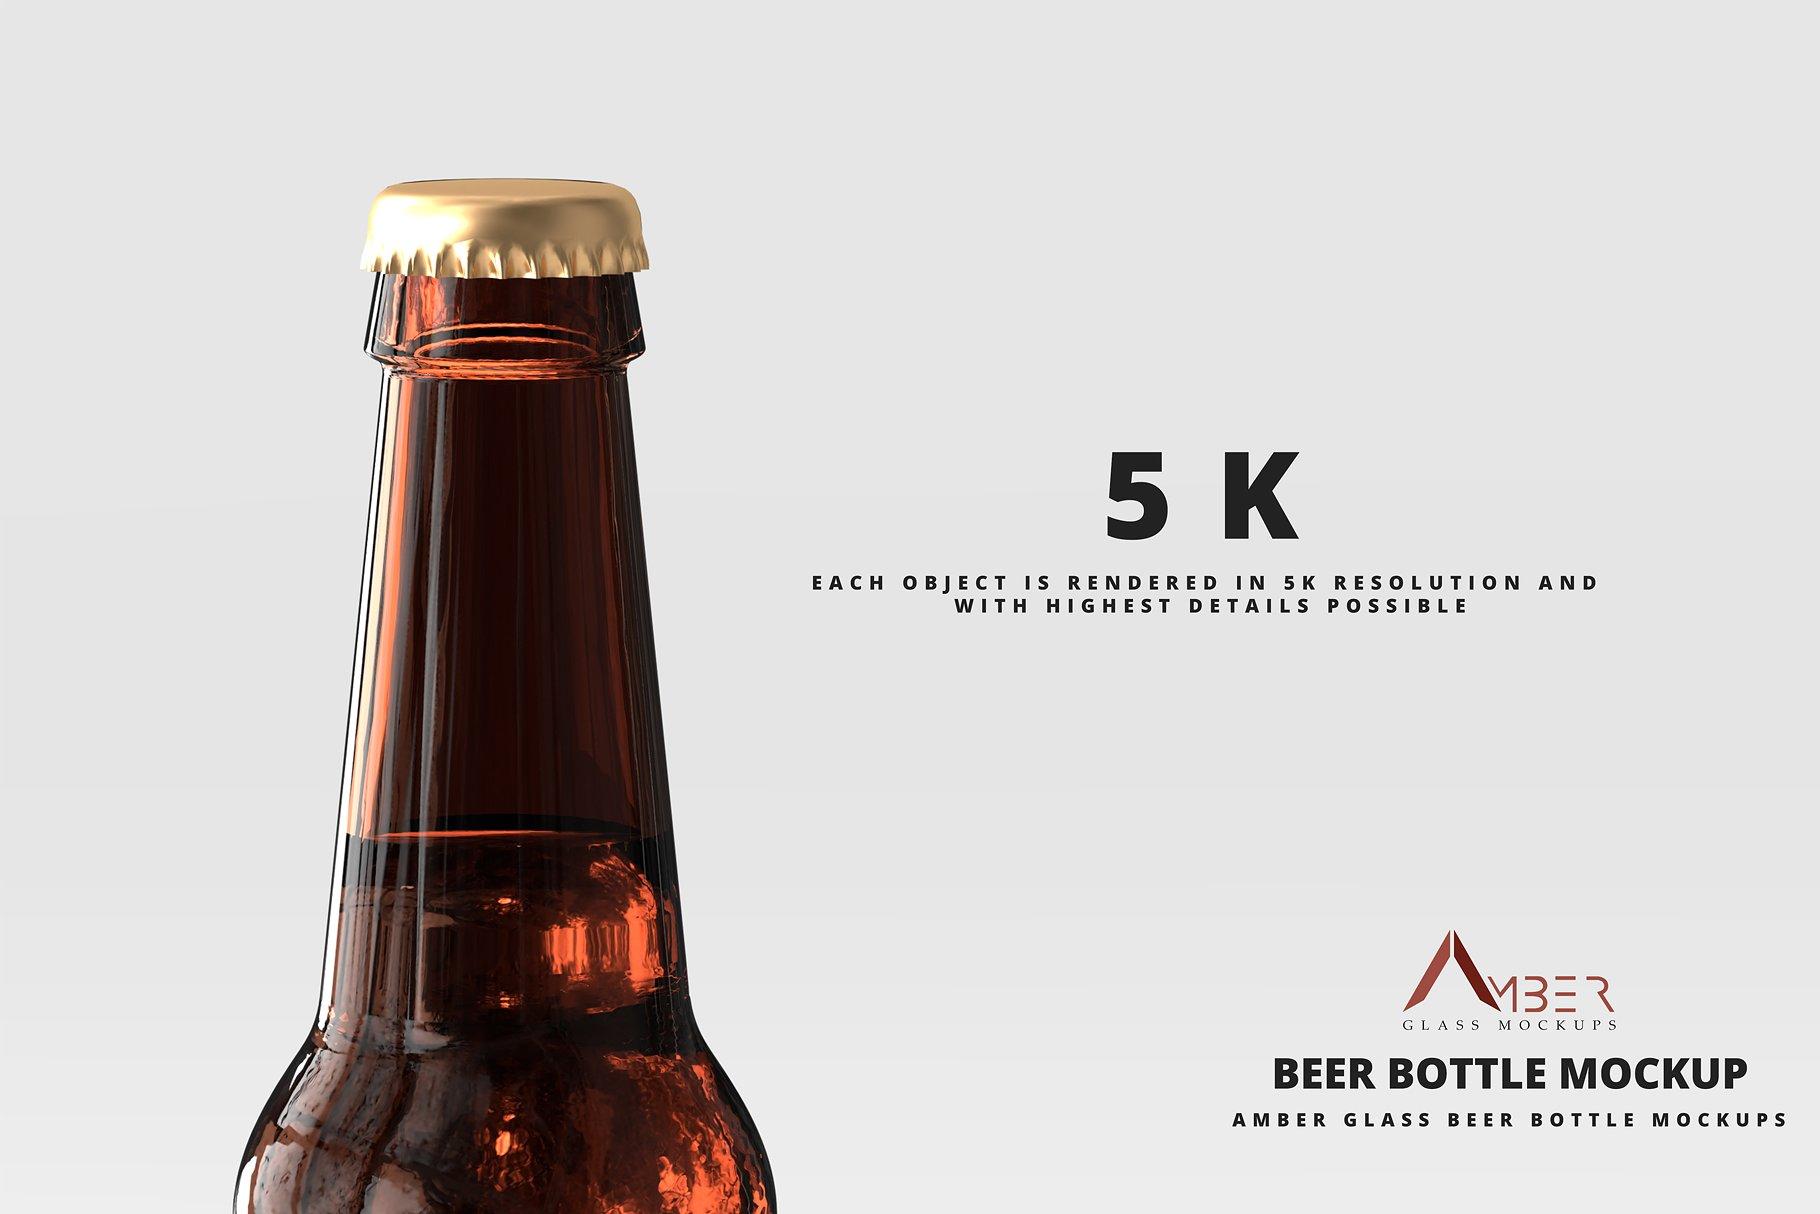 啤酒LOGO标签设计提案展示样机PSD智能贴图模板 Amber Glass Beer Bottle Mockup